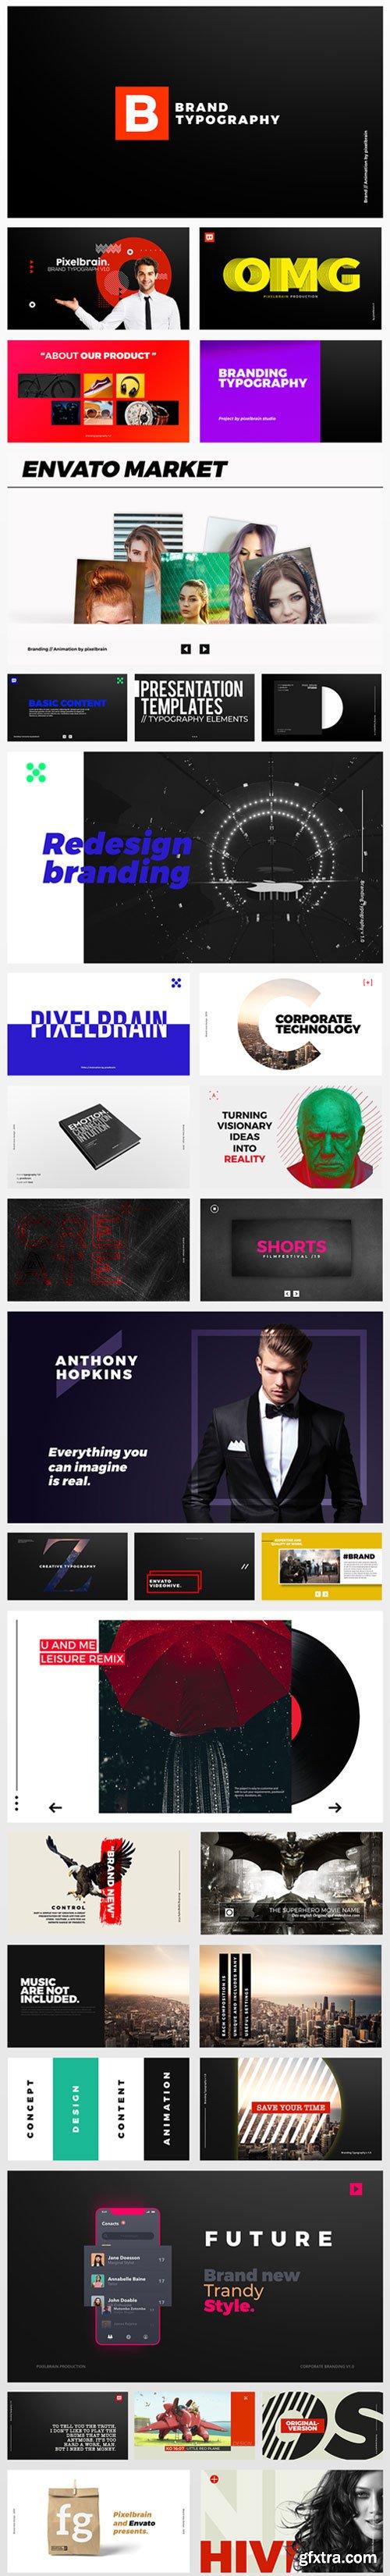 Videohive - Brand Typography - 22817888